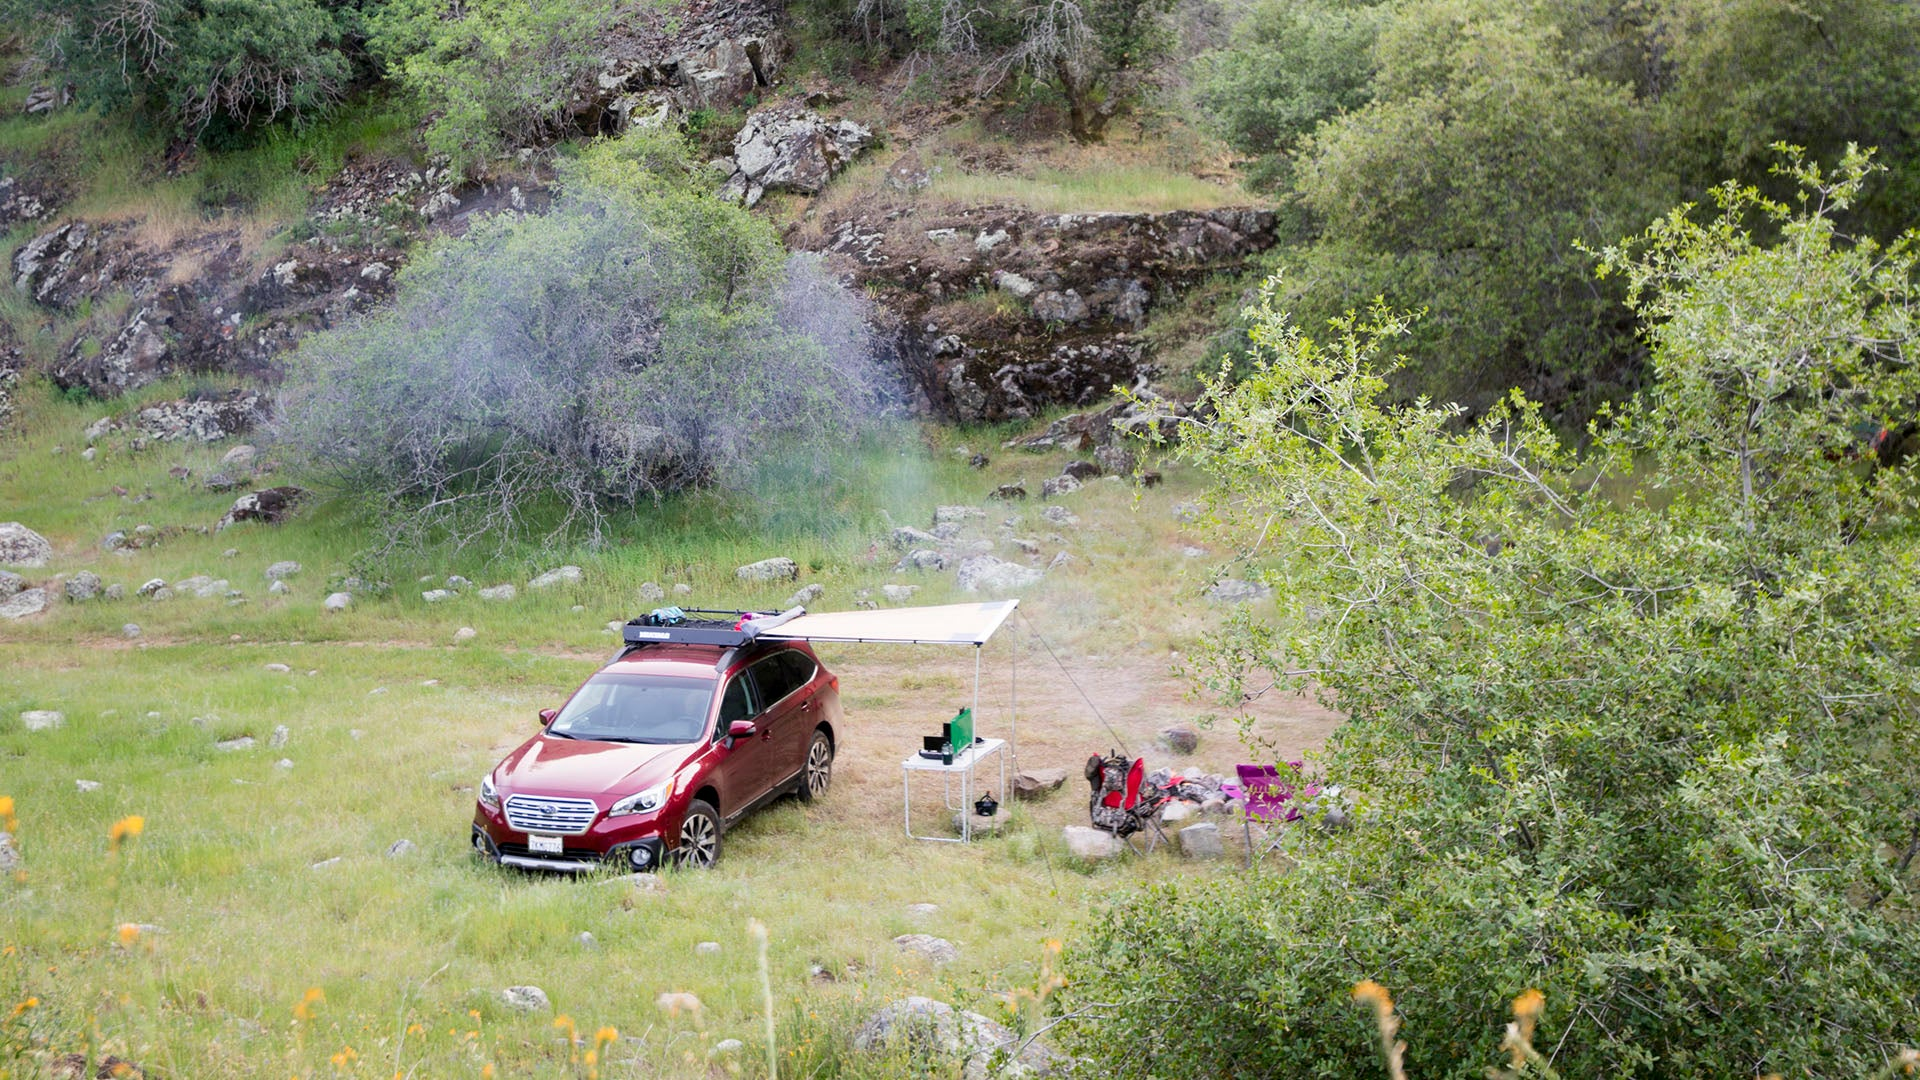 & How I Turned My Subaru Outback Into a Real Adventuremobile